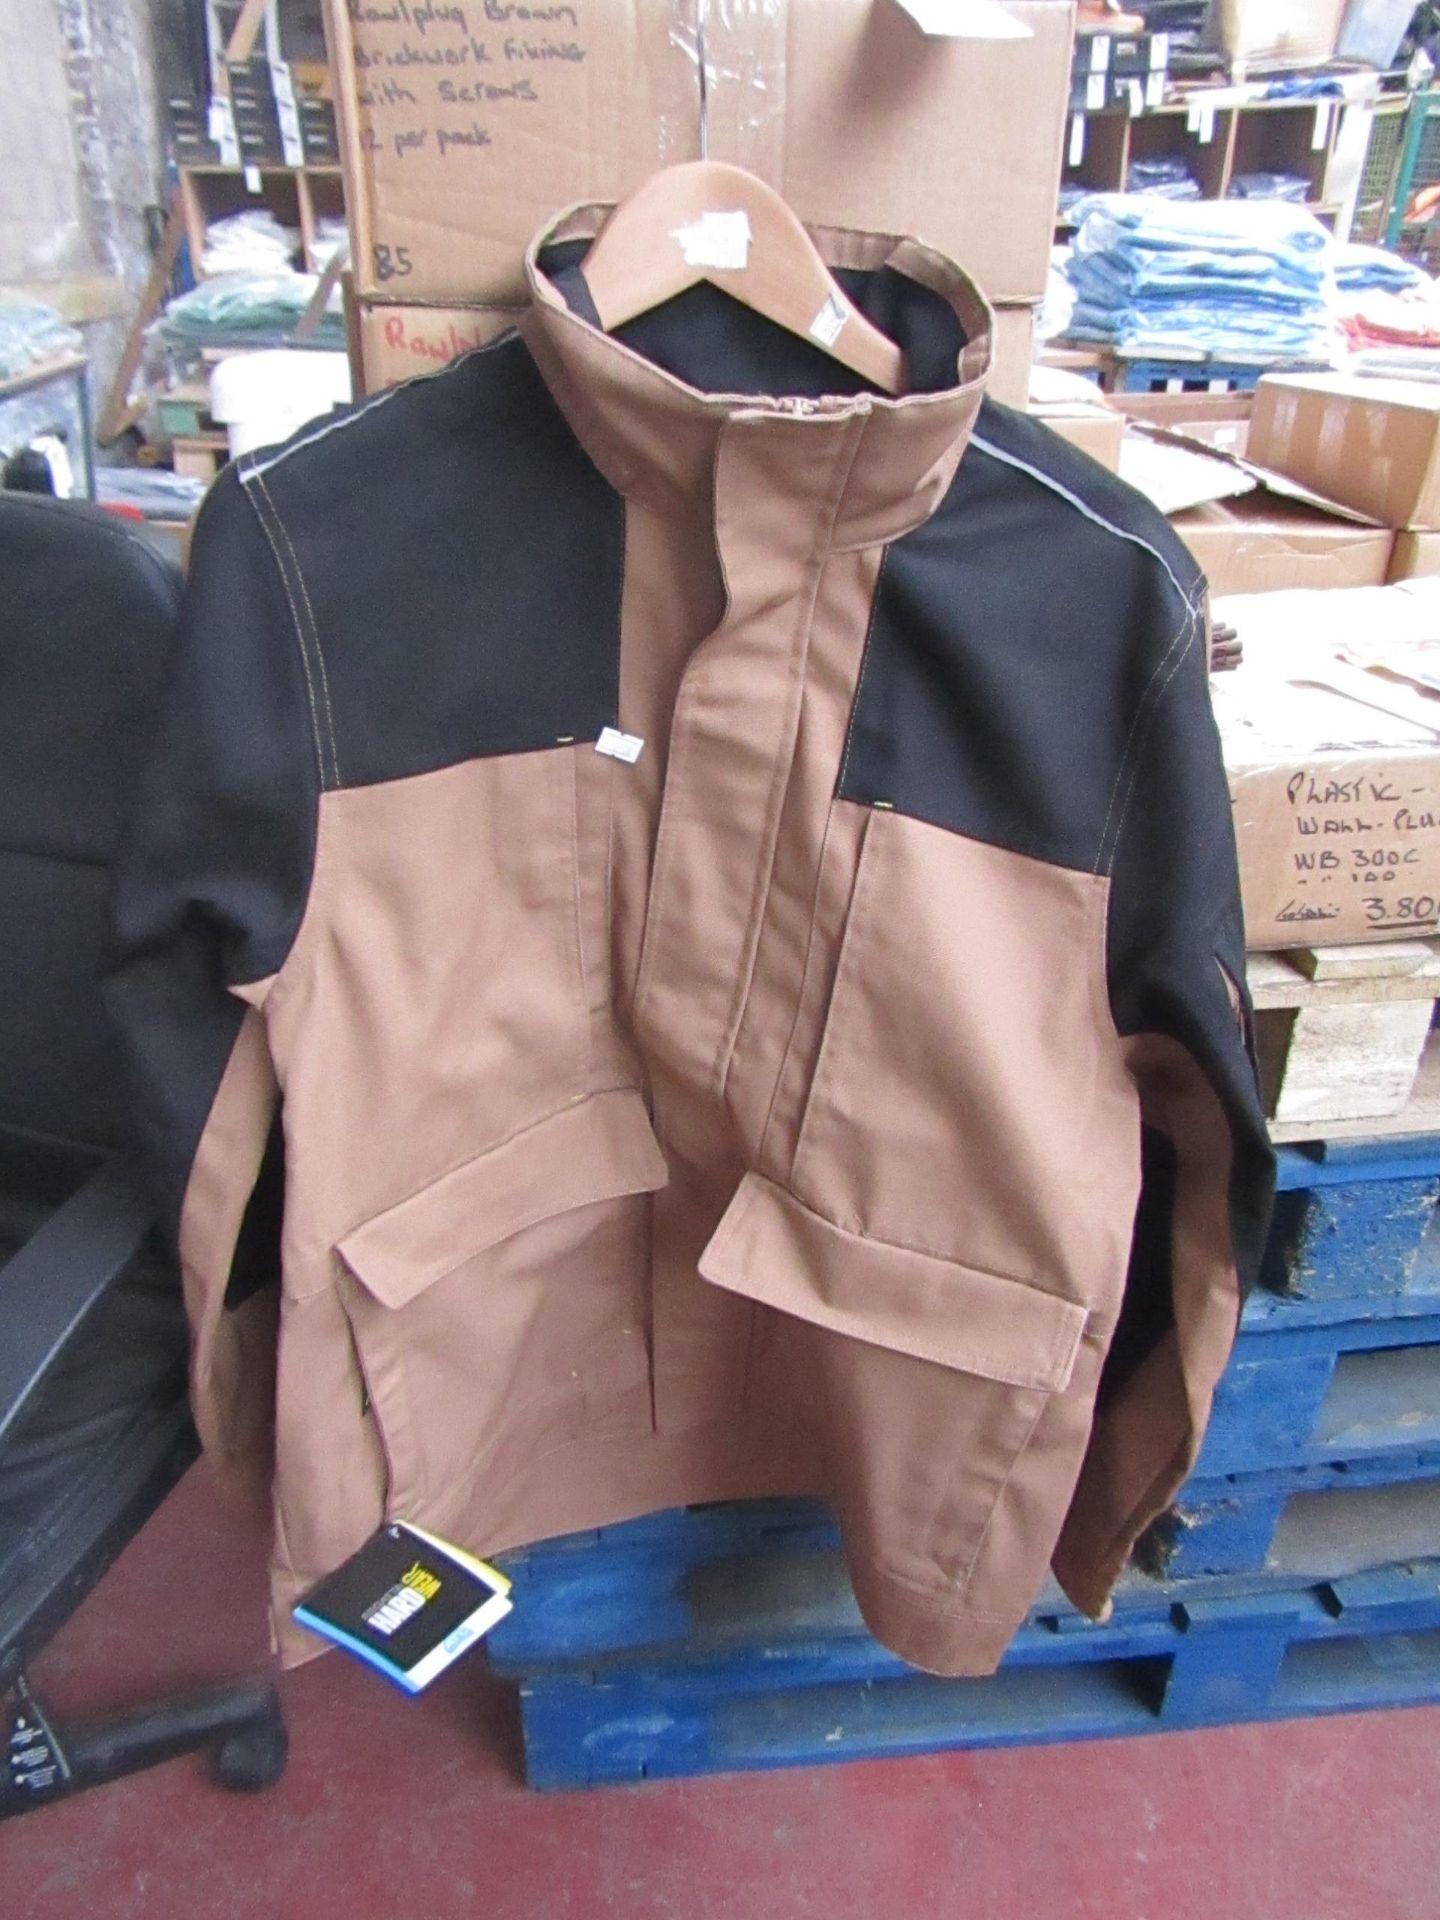 Lot 49 - Regatta Hard wear Jacket Size S, New with Tags